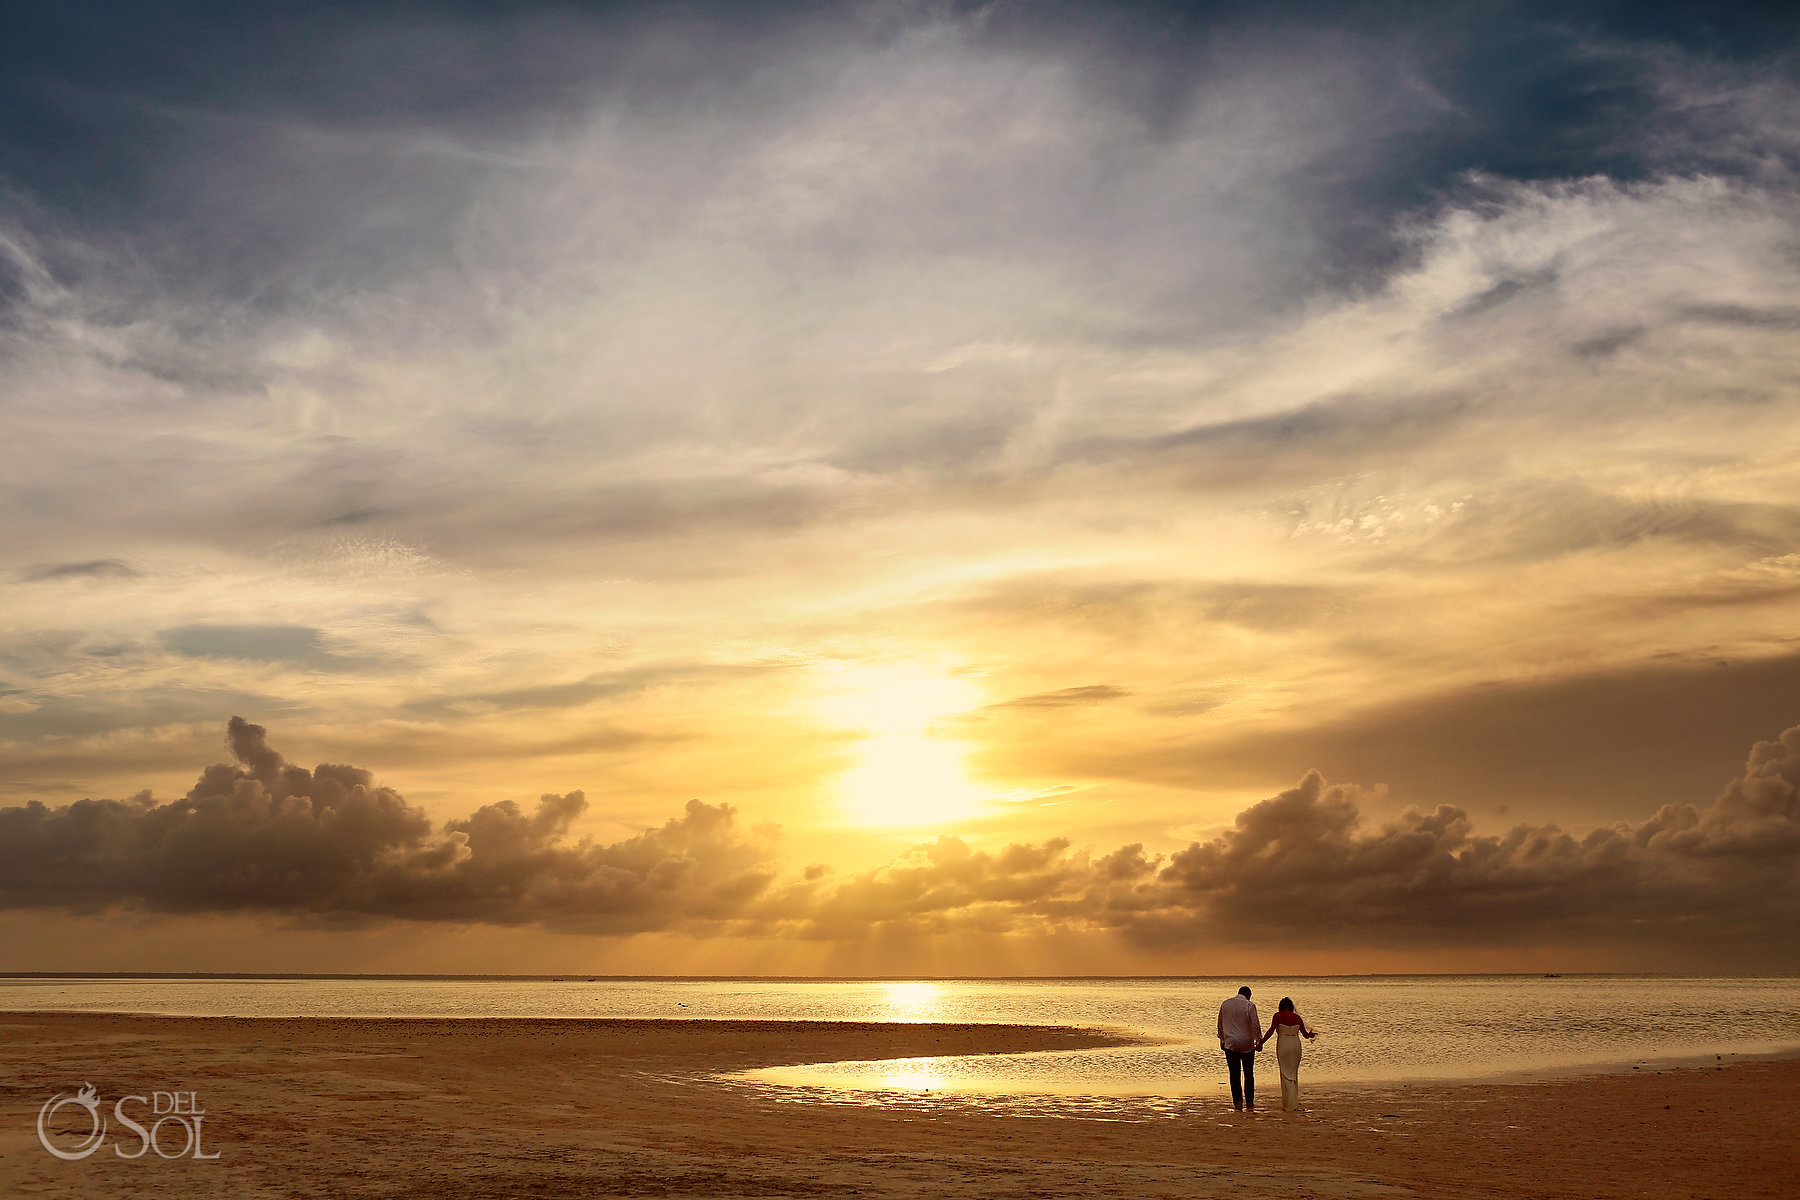 Epic sunset wedding photo location Cancun Mexico